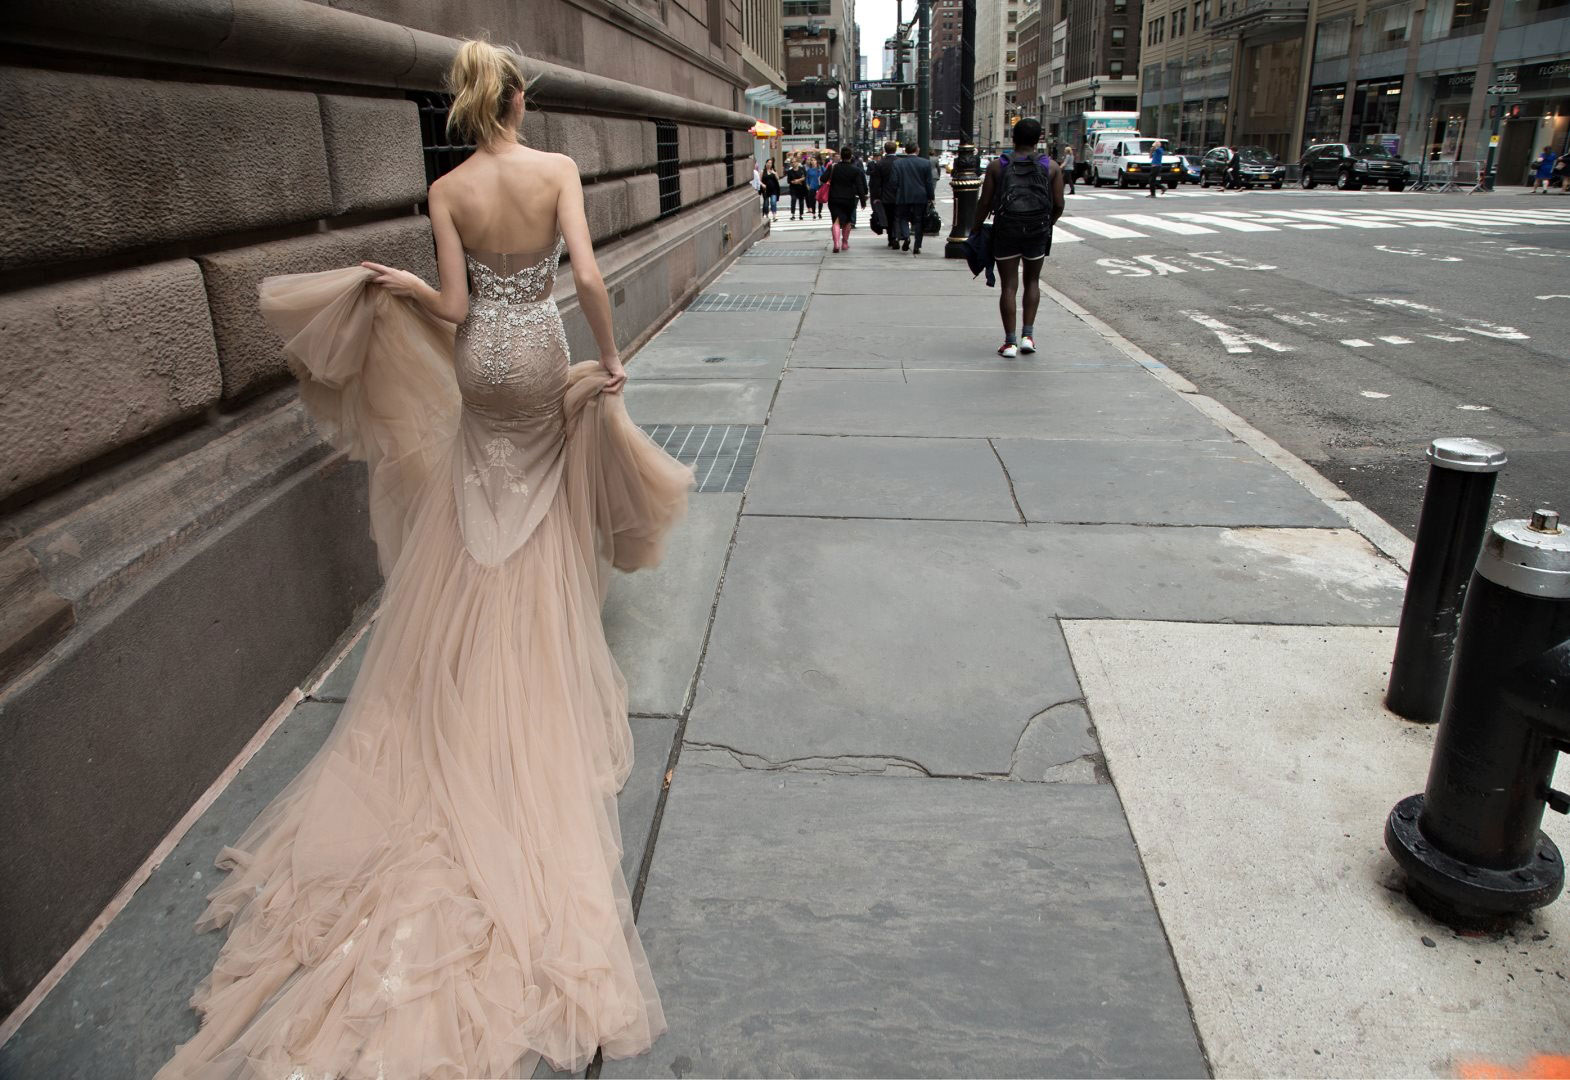 inbal-dror-wedding-gown-detail-street.jpg